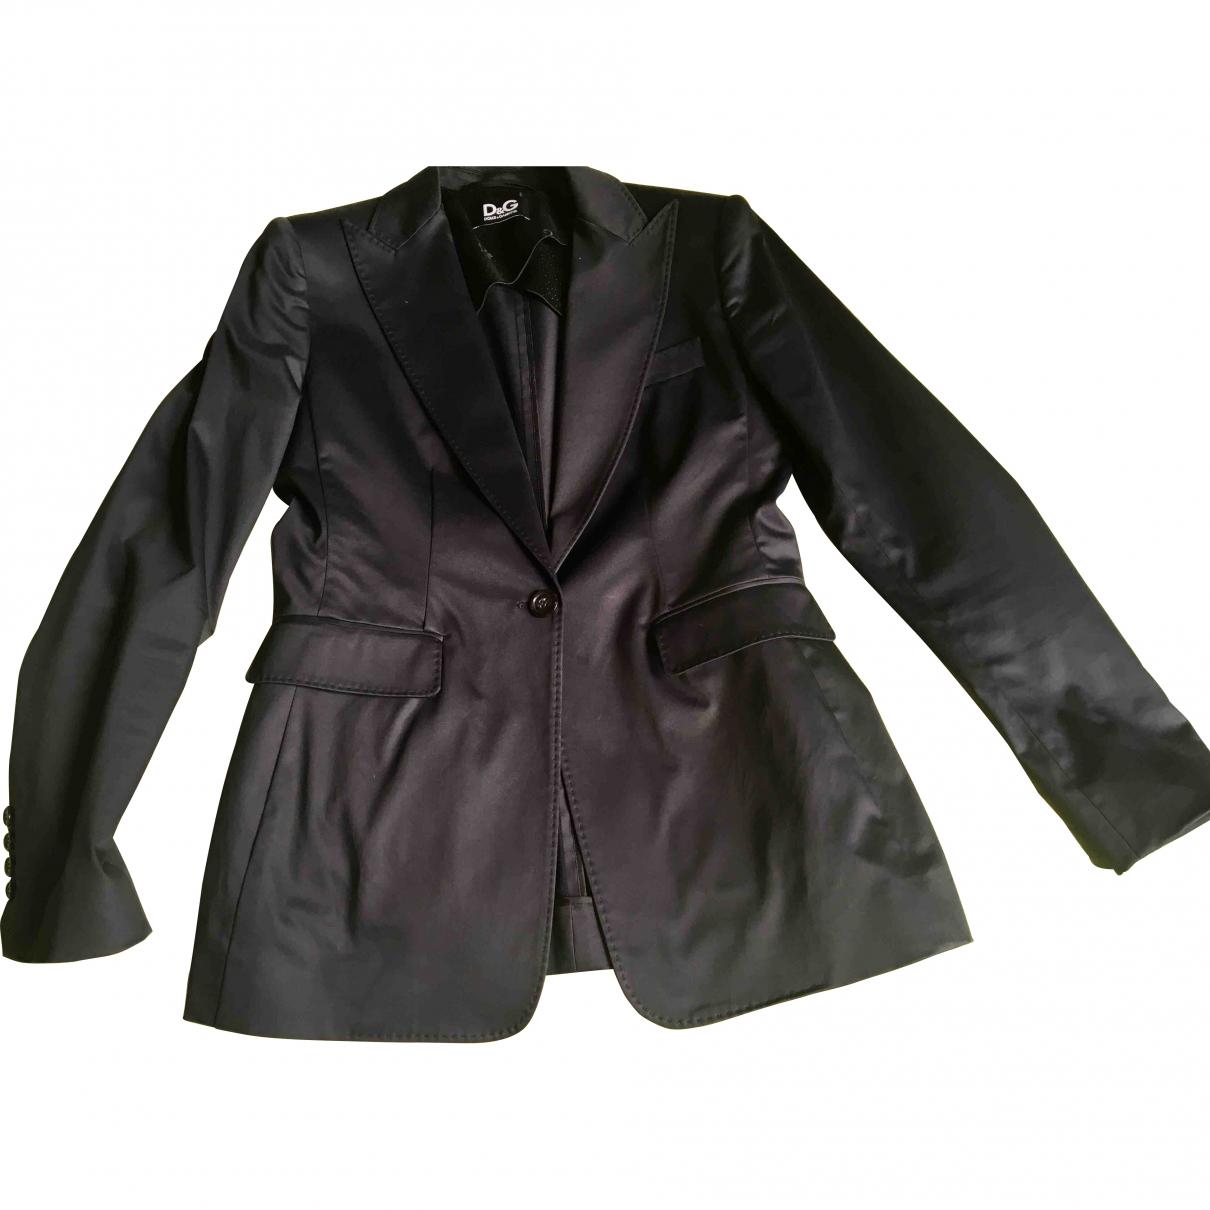 D&g \N Blue Cotton jacket for Women 46 IT